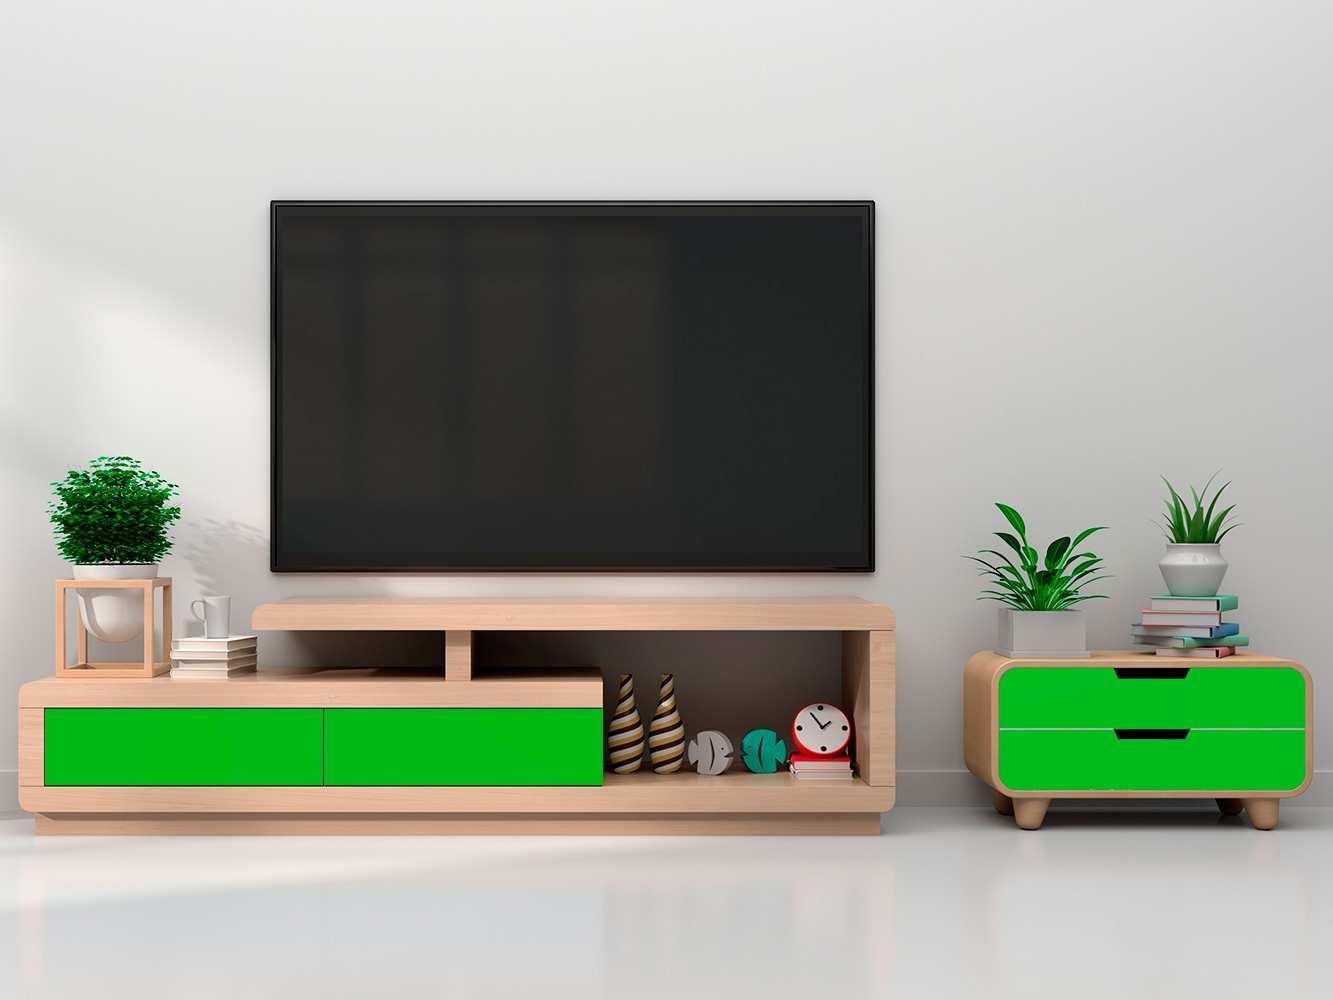 Vinilo Decorativo Mueble Verde | Carteles XXL - Impresión carteleria publicitaria